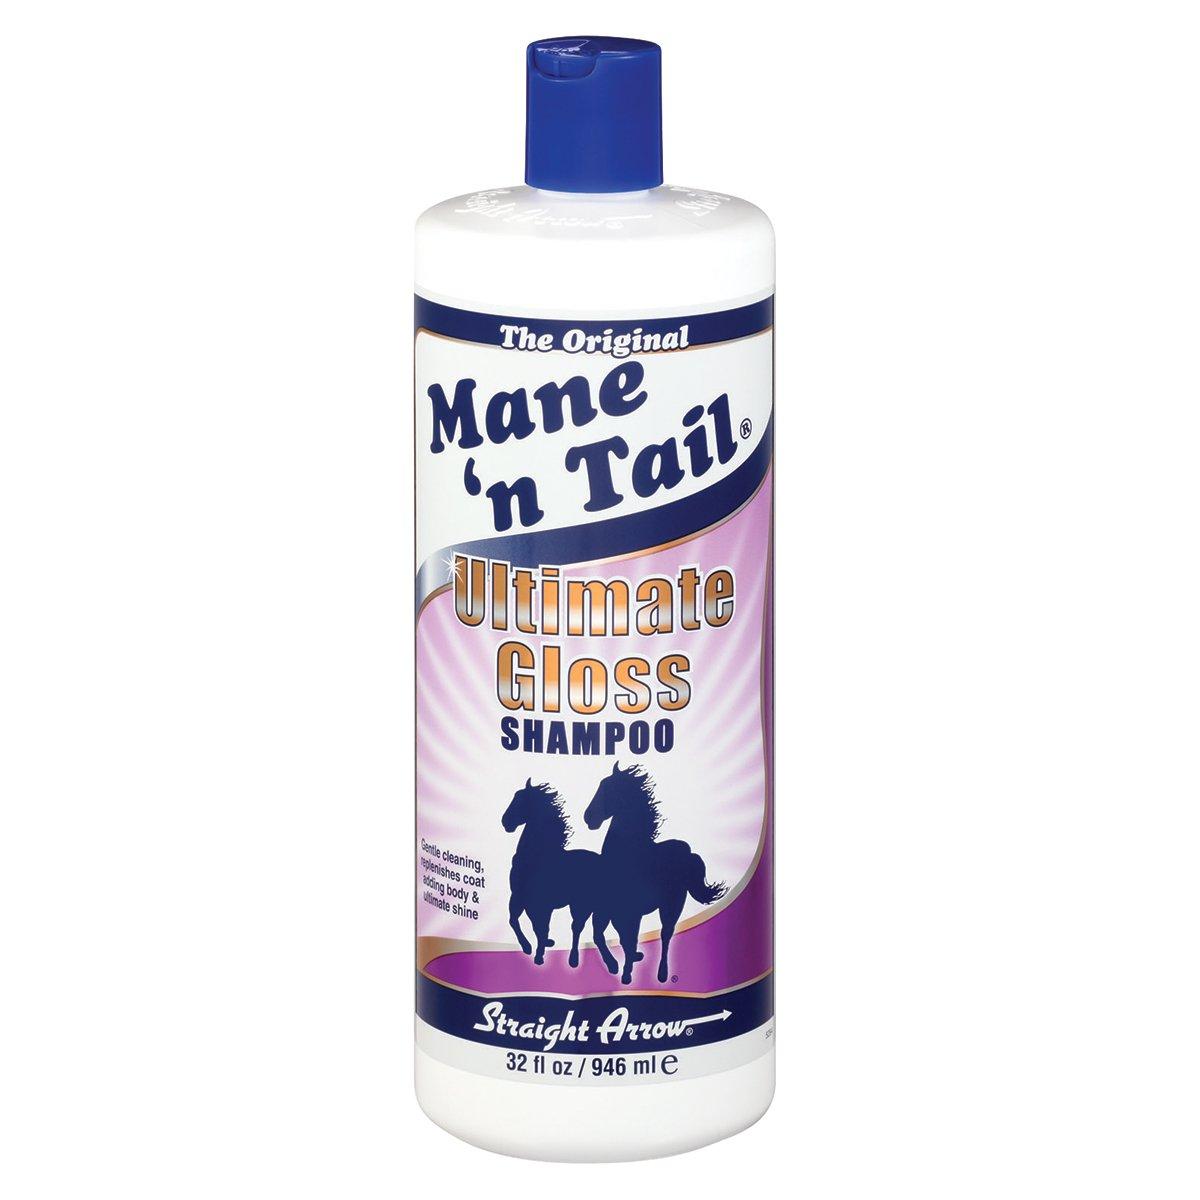 MANE 'N TAIL Ultimate Gloss Shampoo, pro dokonalý lesk 946 ml